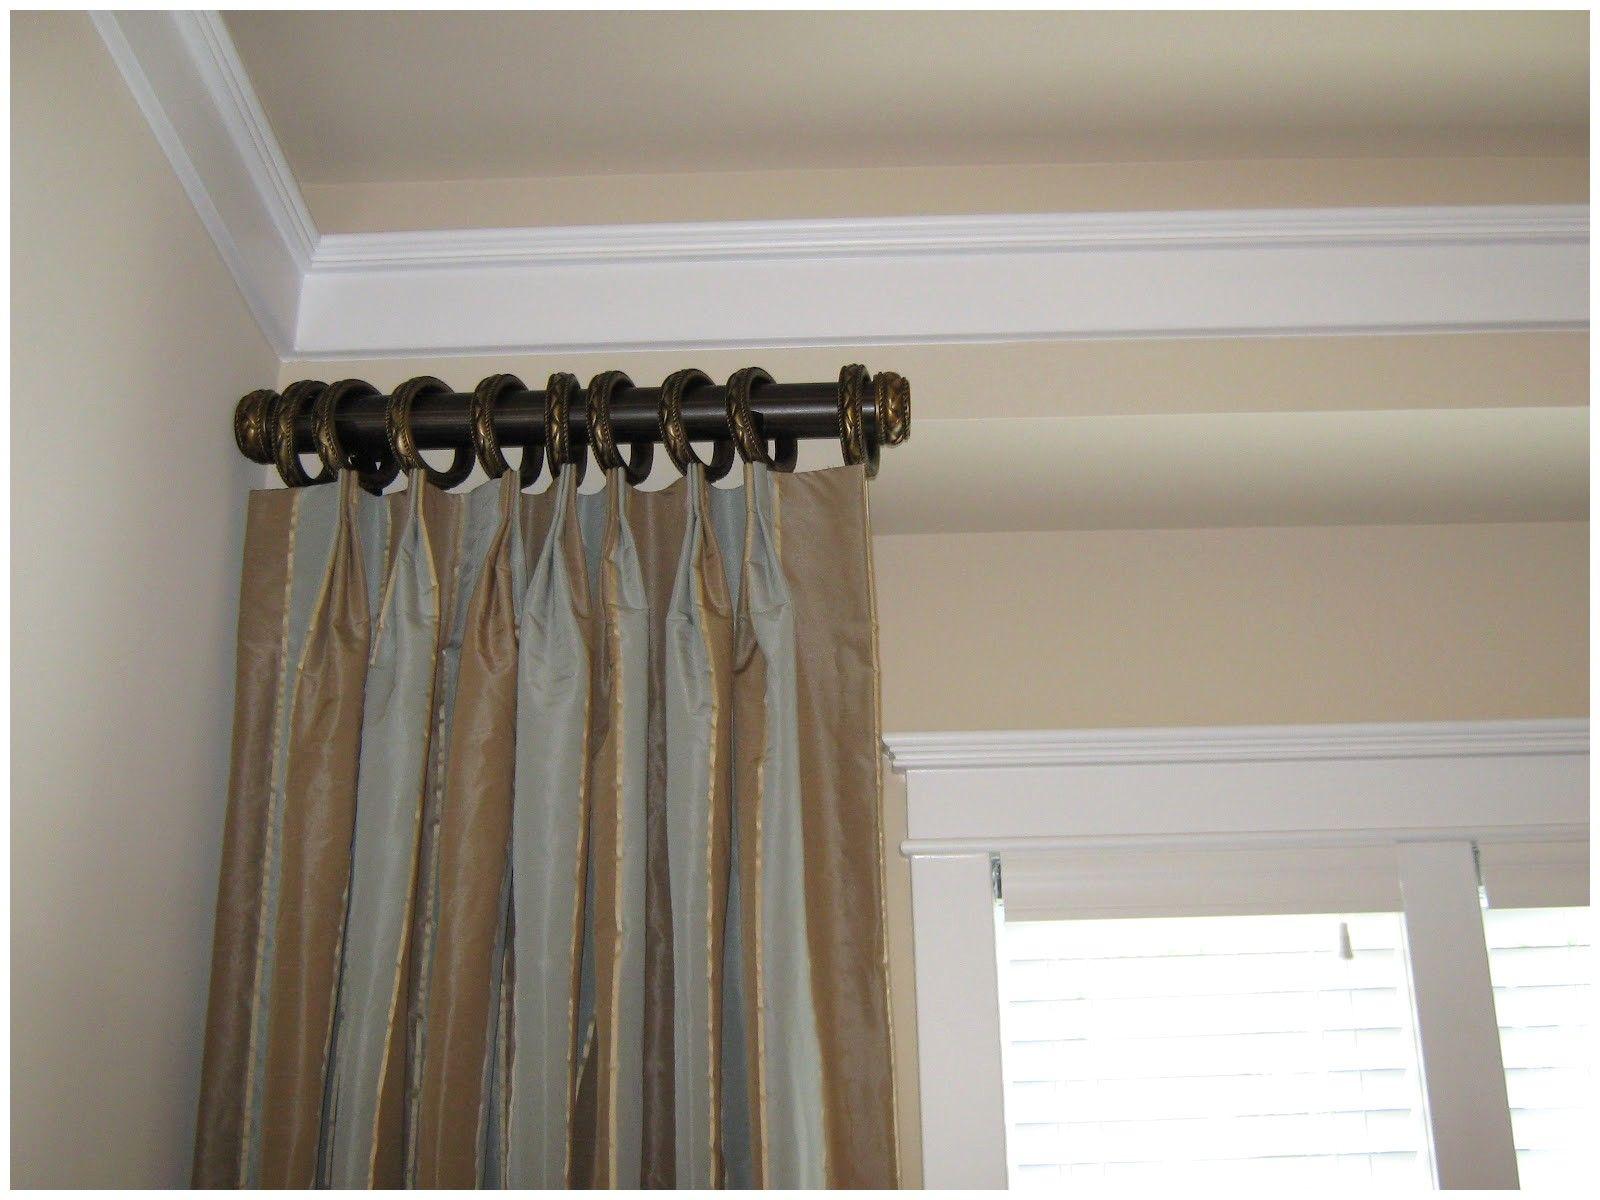 Best Short Curtain Rods Ideas Design Ideas 2018 Justinandanna Inside Proportions 1600 X 1200 Small Curtain Rods Long Curtain Rods Short Curtain Rods